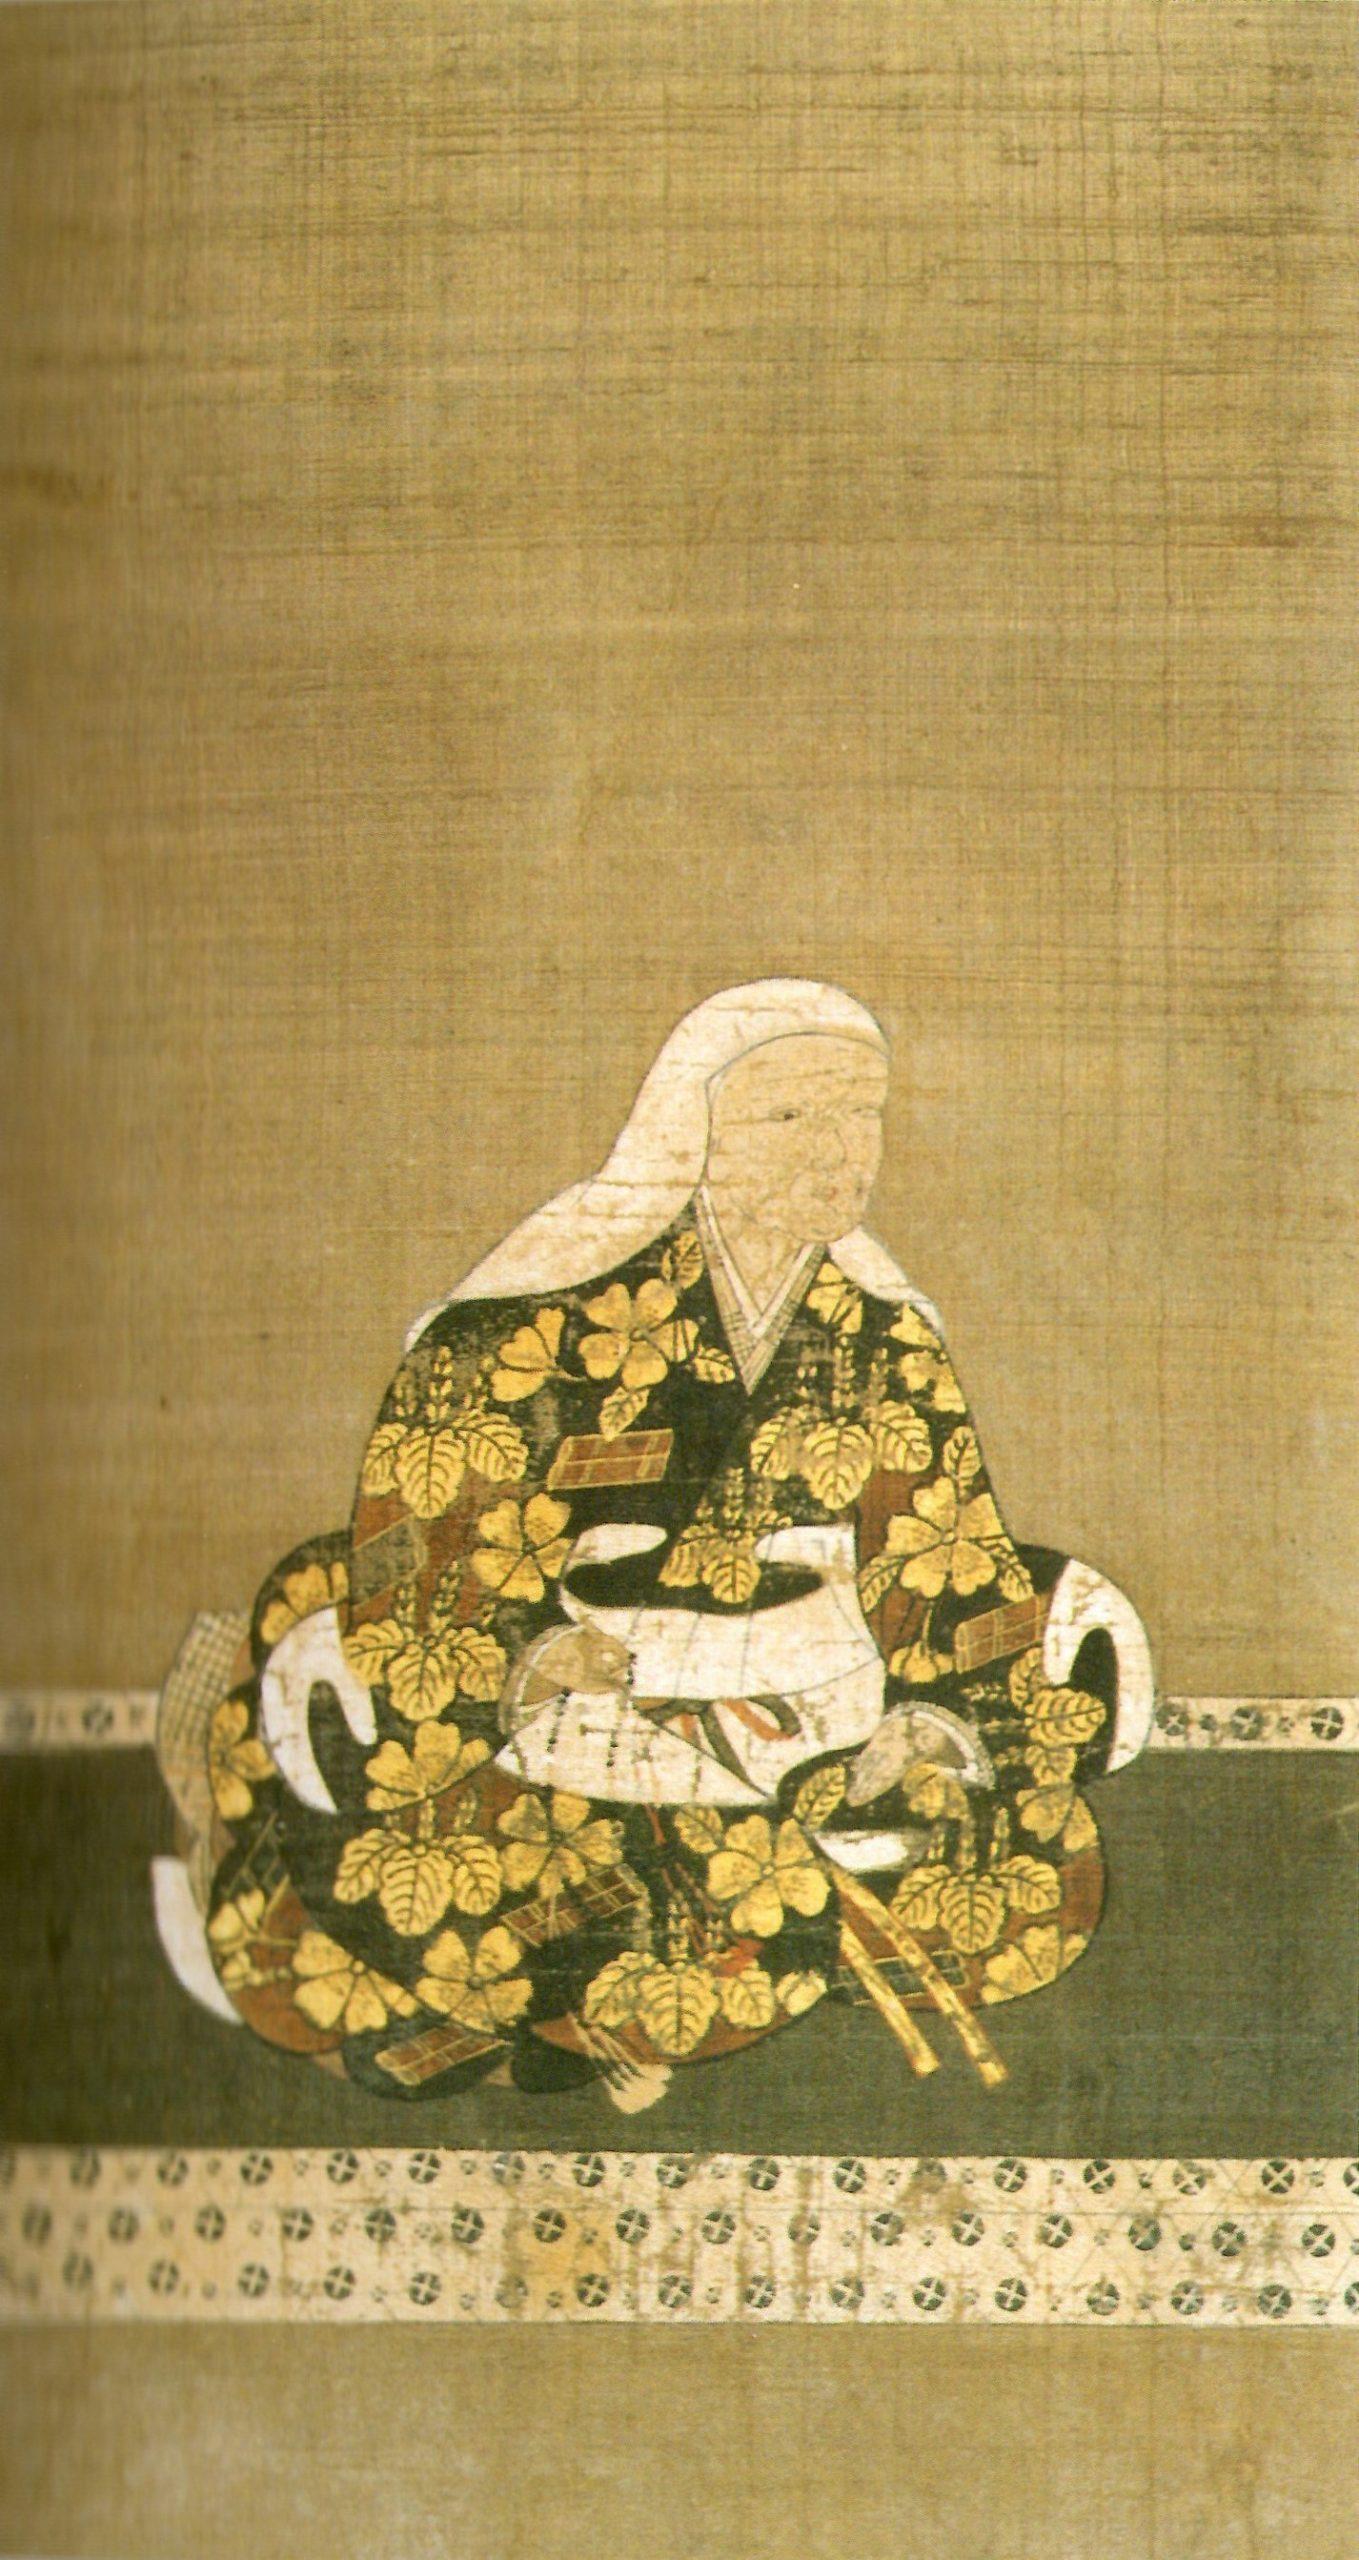 於大の方(伝通院)(『愛知県史』愛知県、1935)の画像。